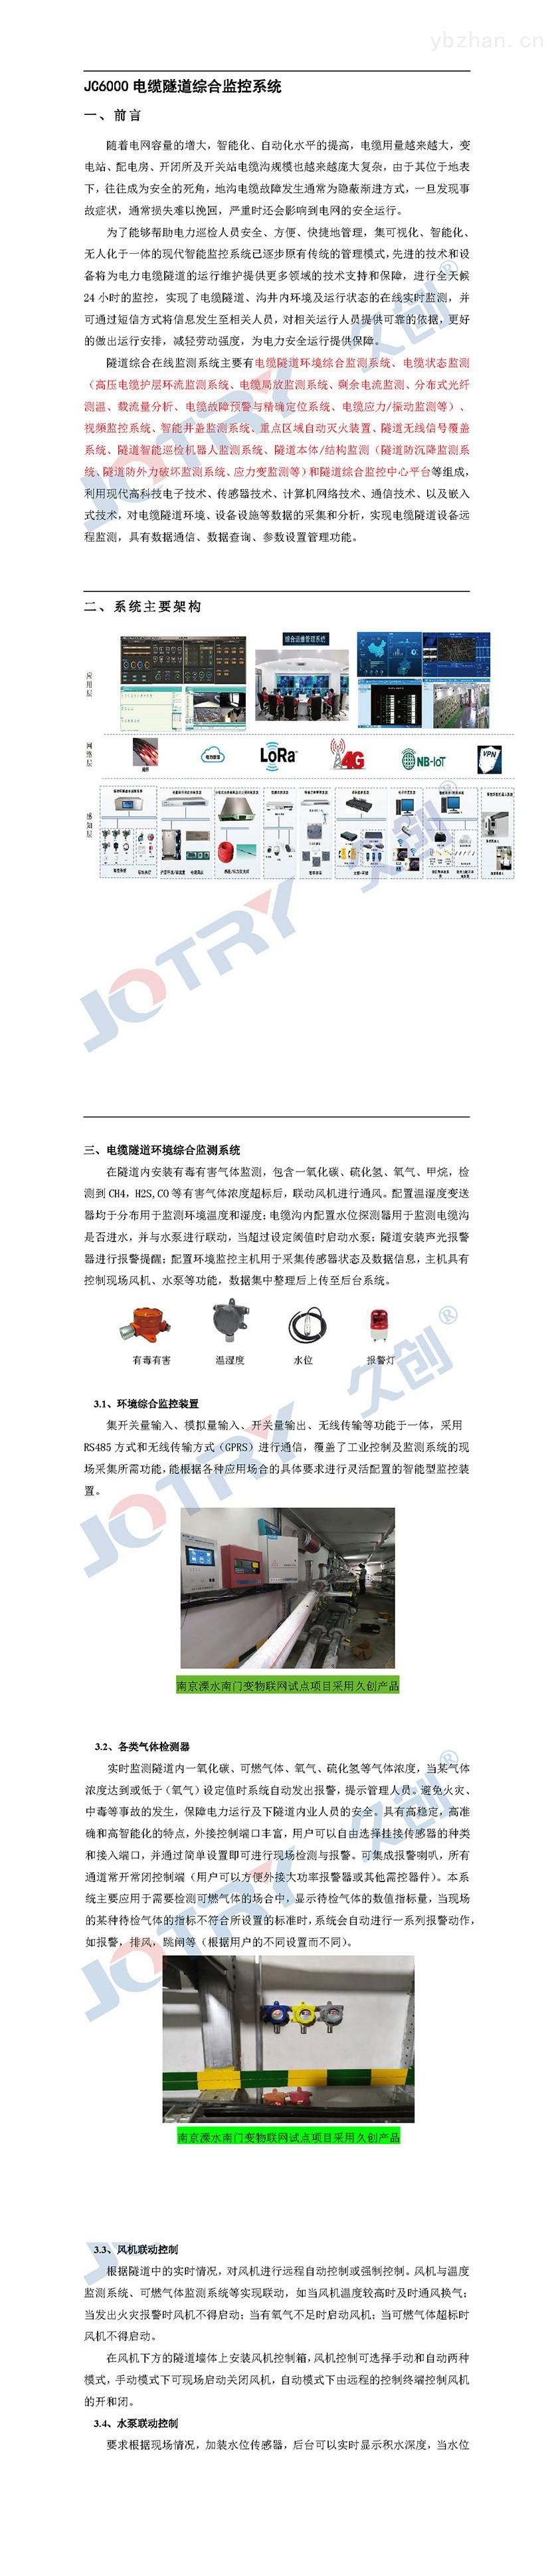 <strong>电缆隧道综合监控系统</strong>02-恢复的01.jpg